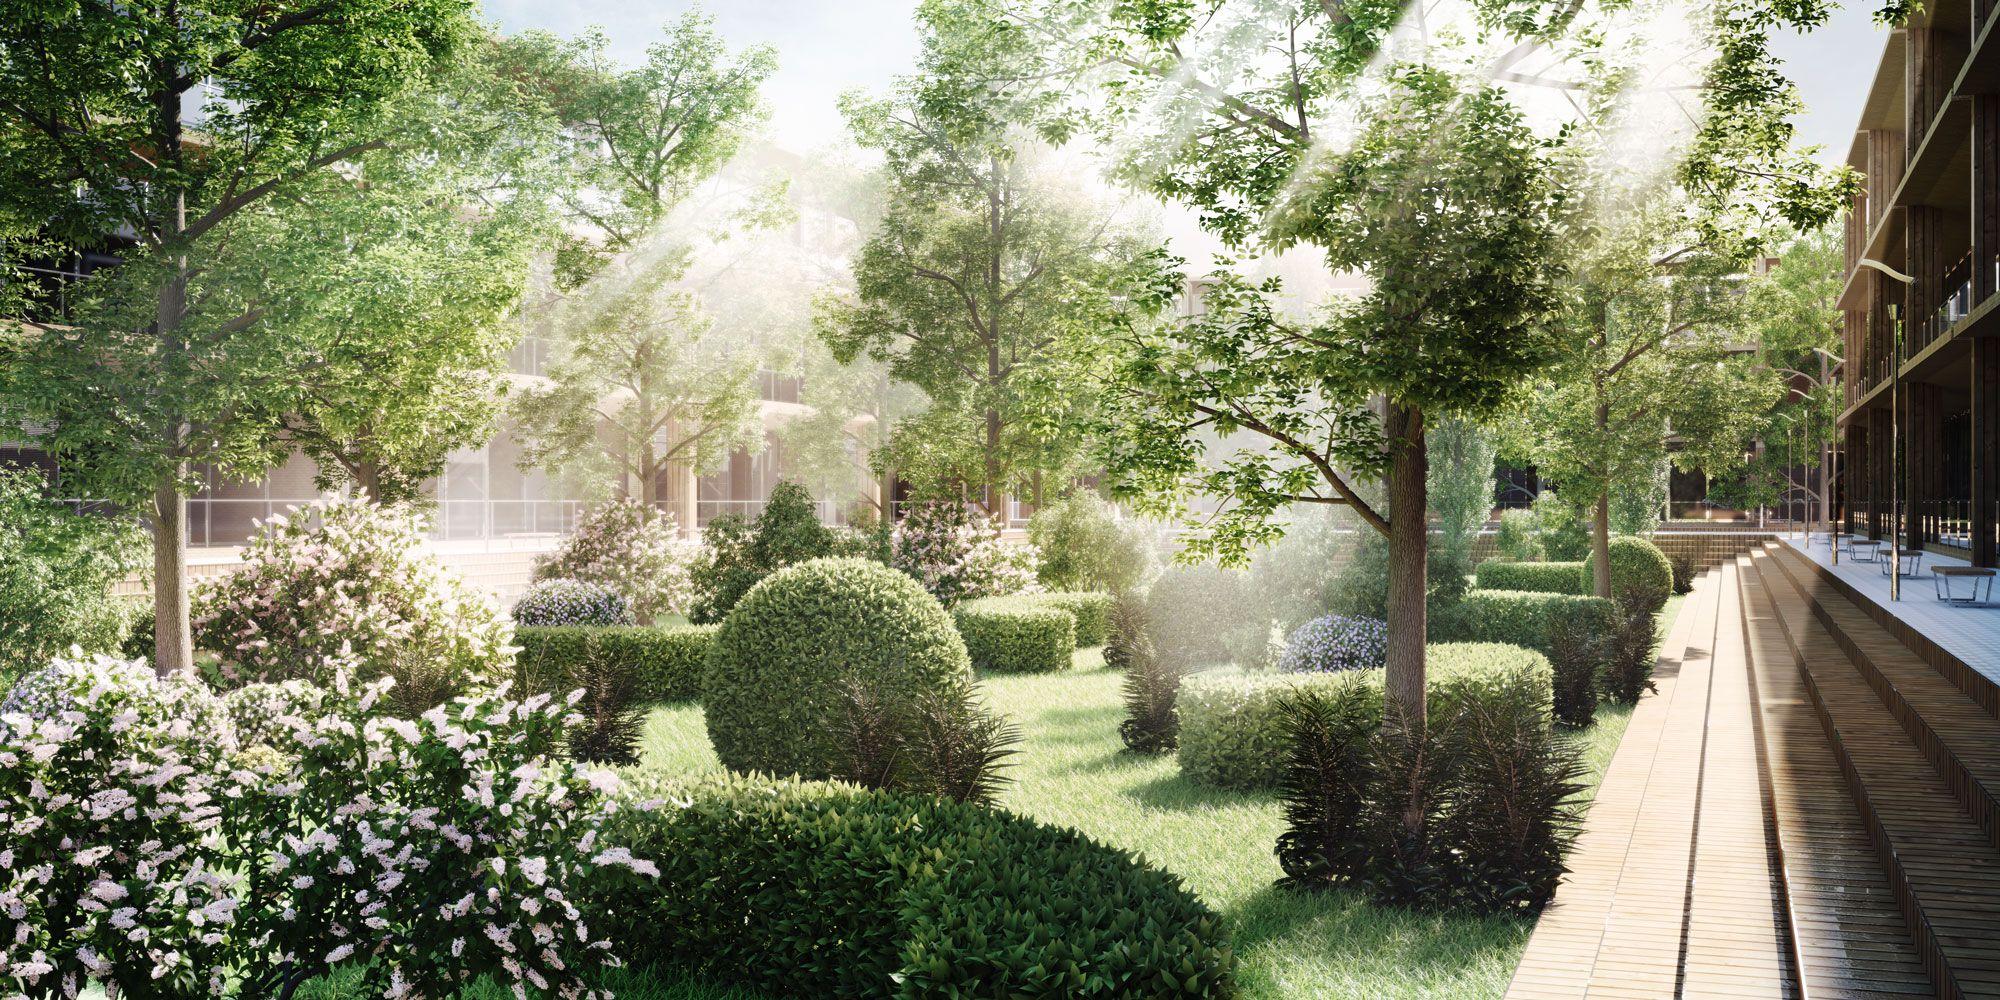 Pin by Jenneal on LA Perspective | Arcadia garden, Garden ... on Arcadia Backyard Designs id=47775